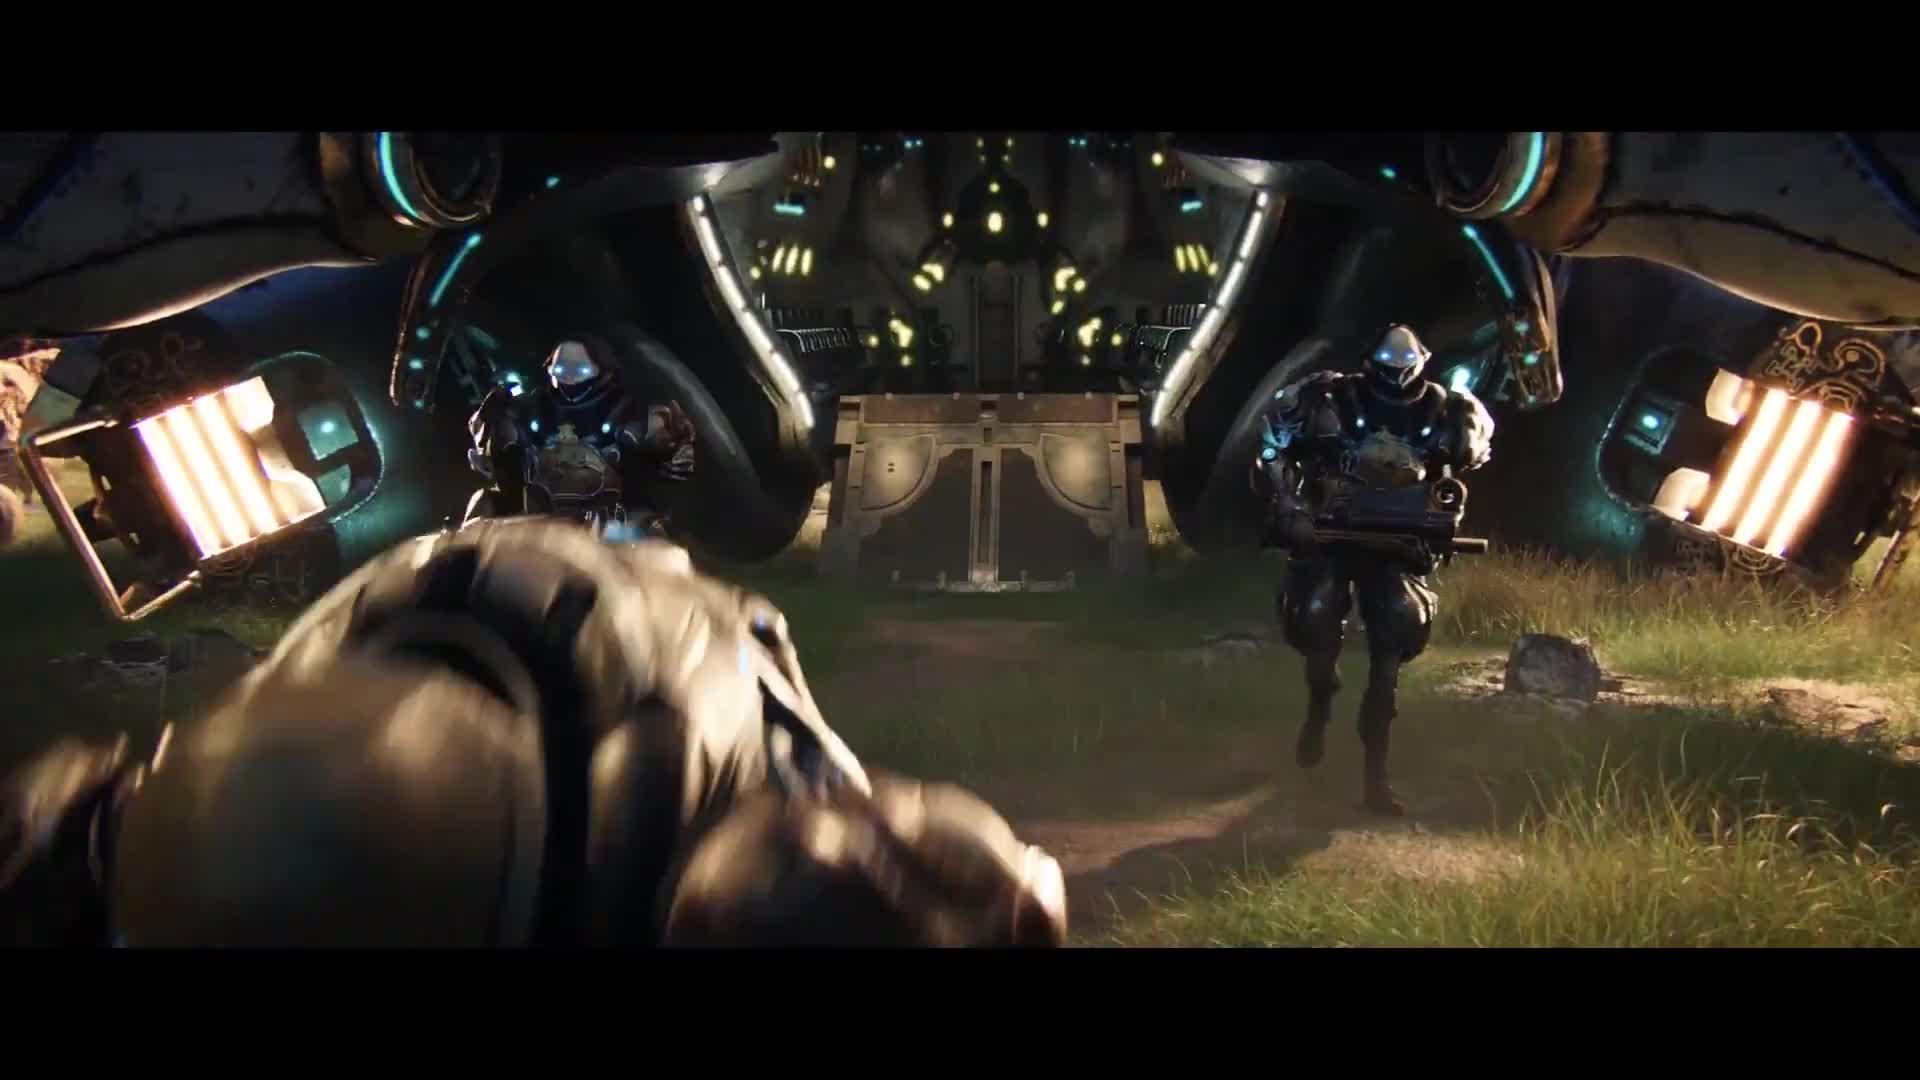 baro ki'teer, dan trachtenberg, games, ign, tenno, tennocon, tennocon 2019, void trader, warframe, warframe chroma, warframe cinematic, warframe gameplay, warframe intro, warframe intro cinematic, warframe movie, warframe tennocon, warframe tennocon 2019, warframe update, wickedfun, Warframe - Official Intro Cinematic GIFs